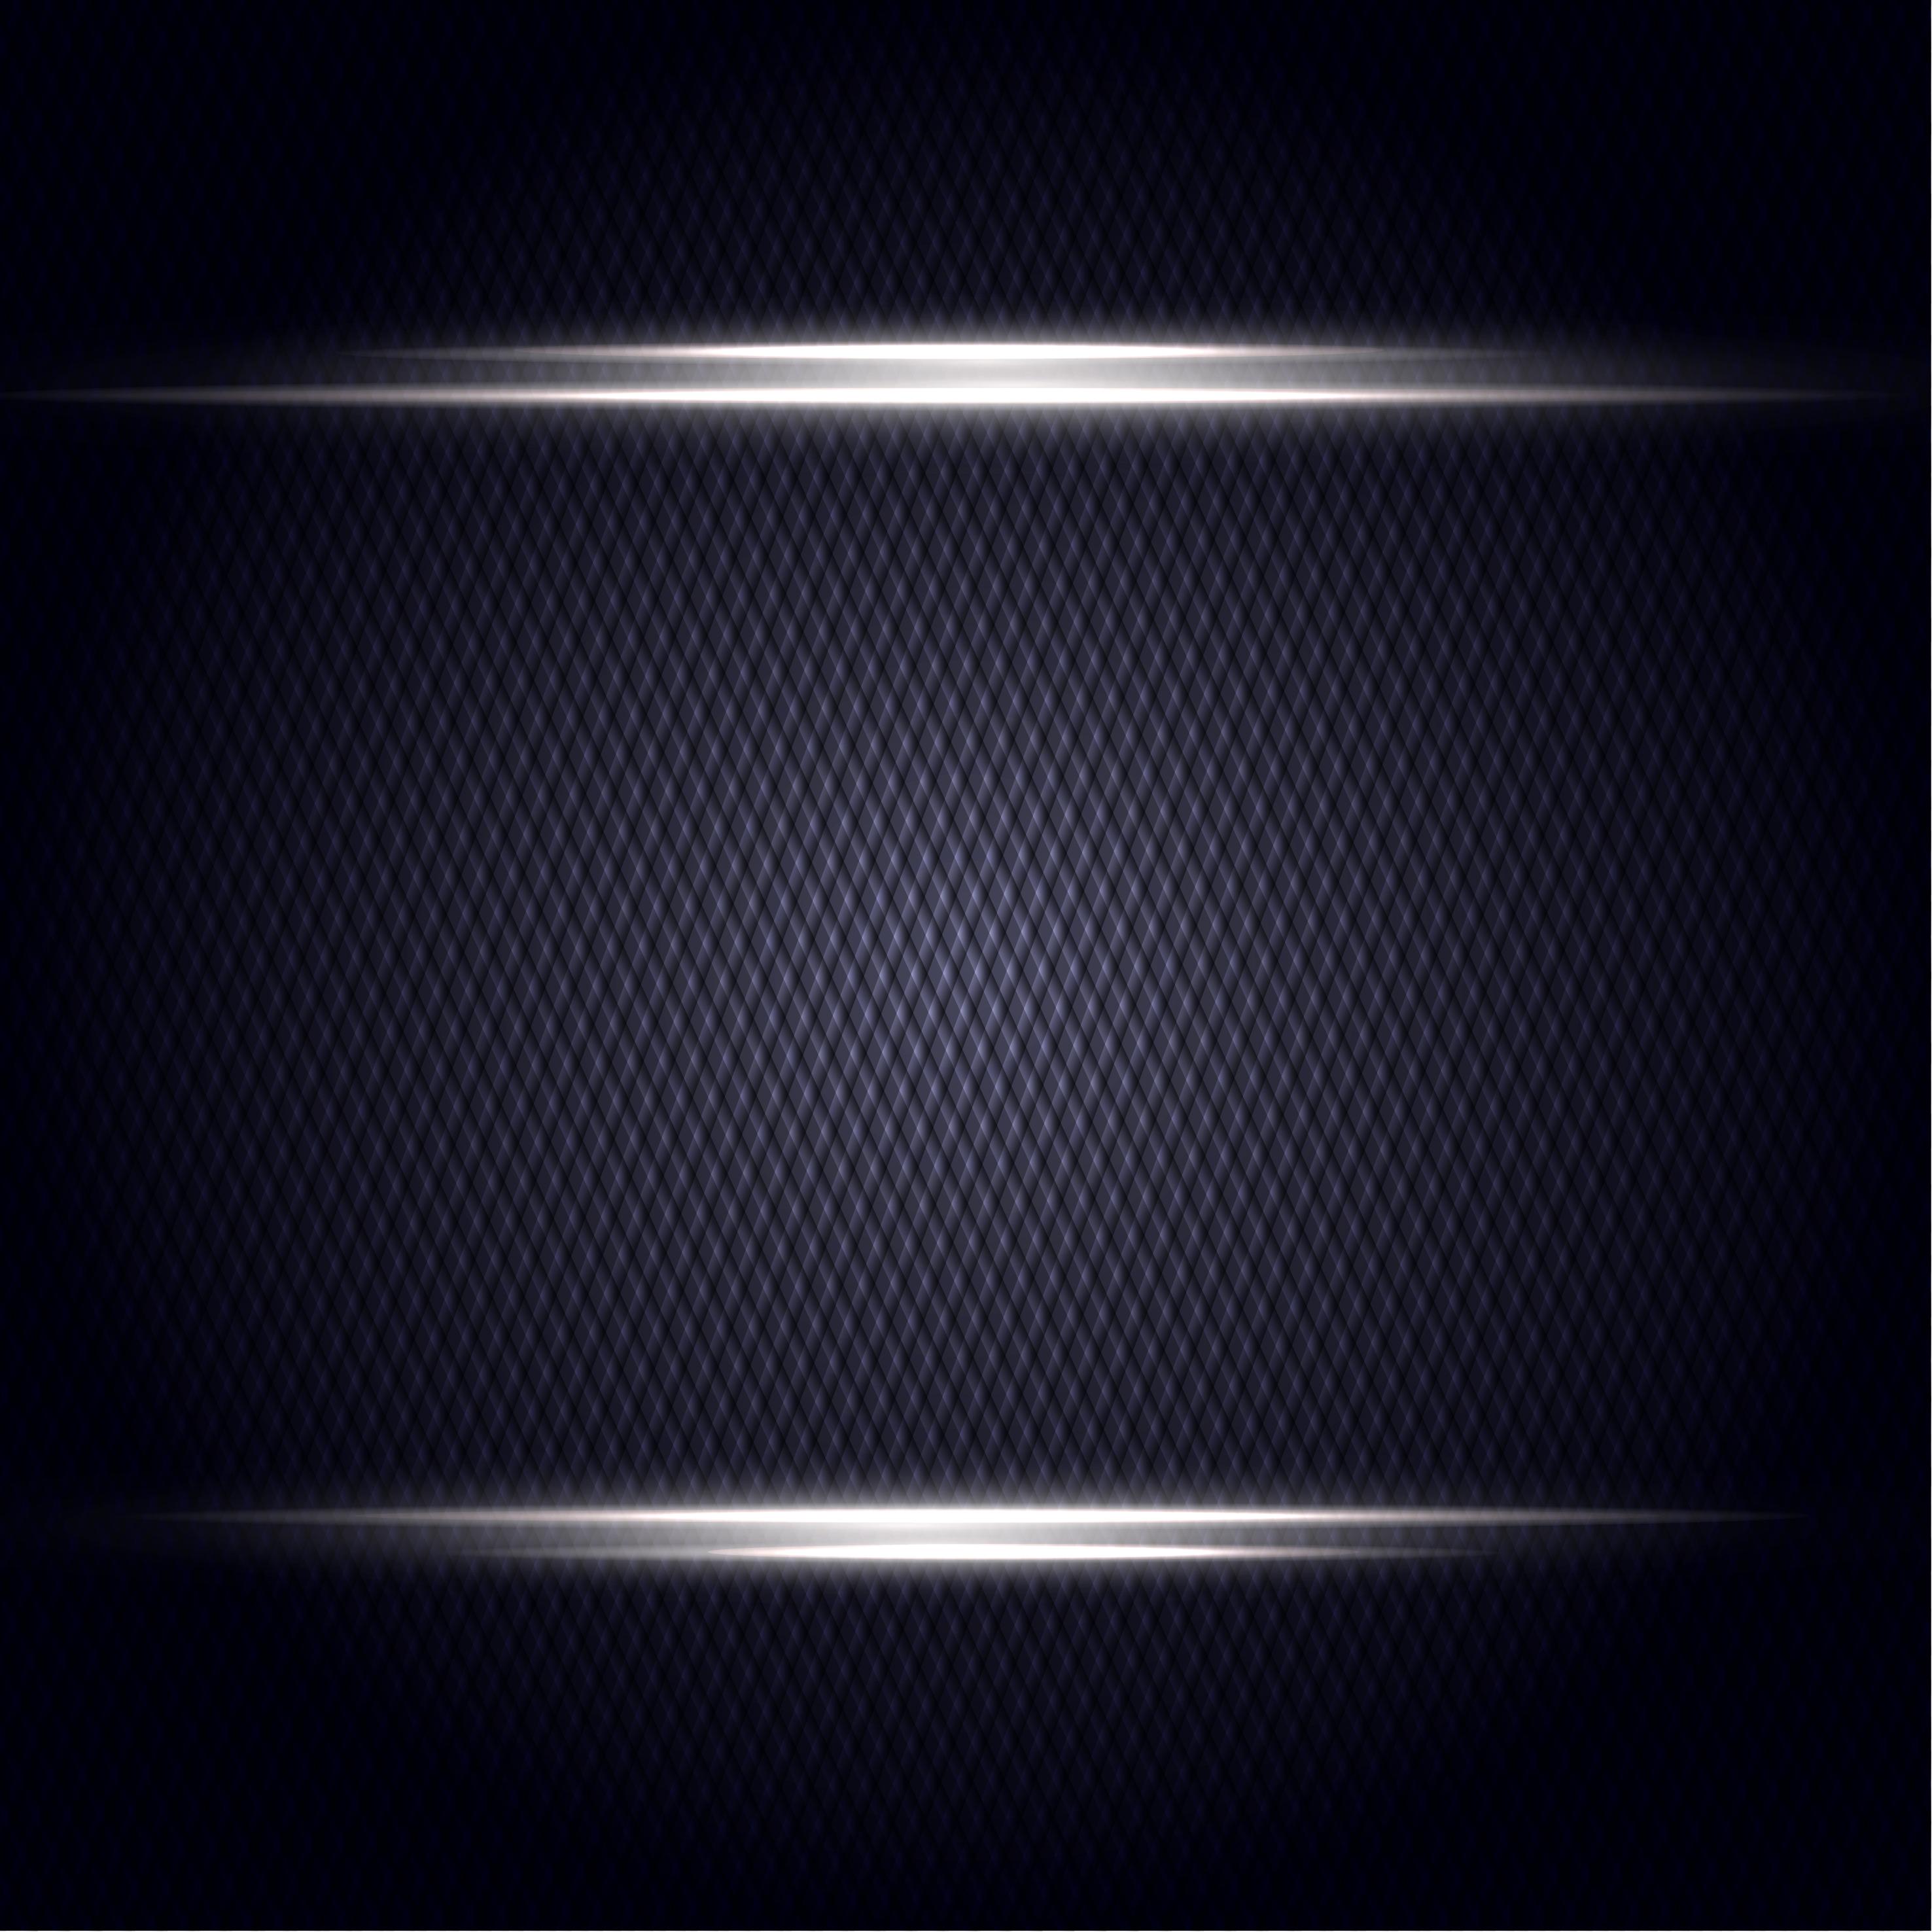 Simple Black Metallic Grid Background Material, Simple